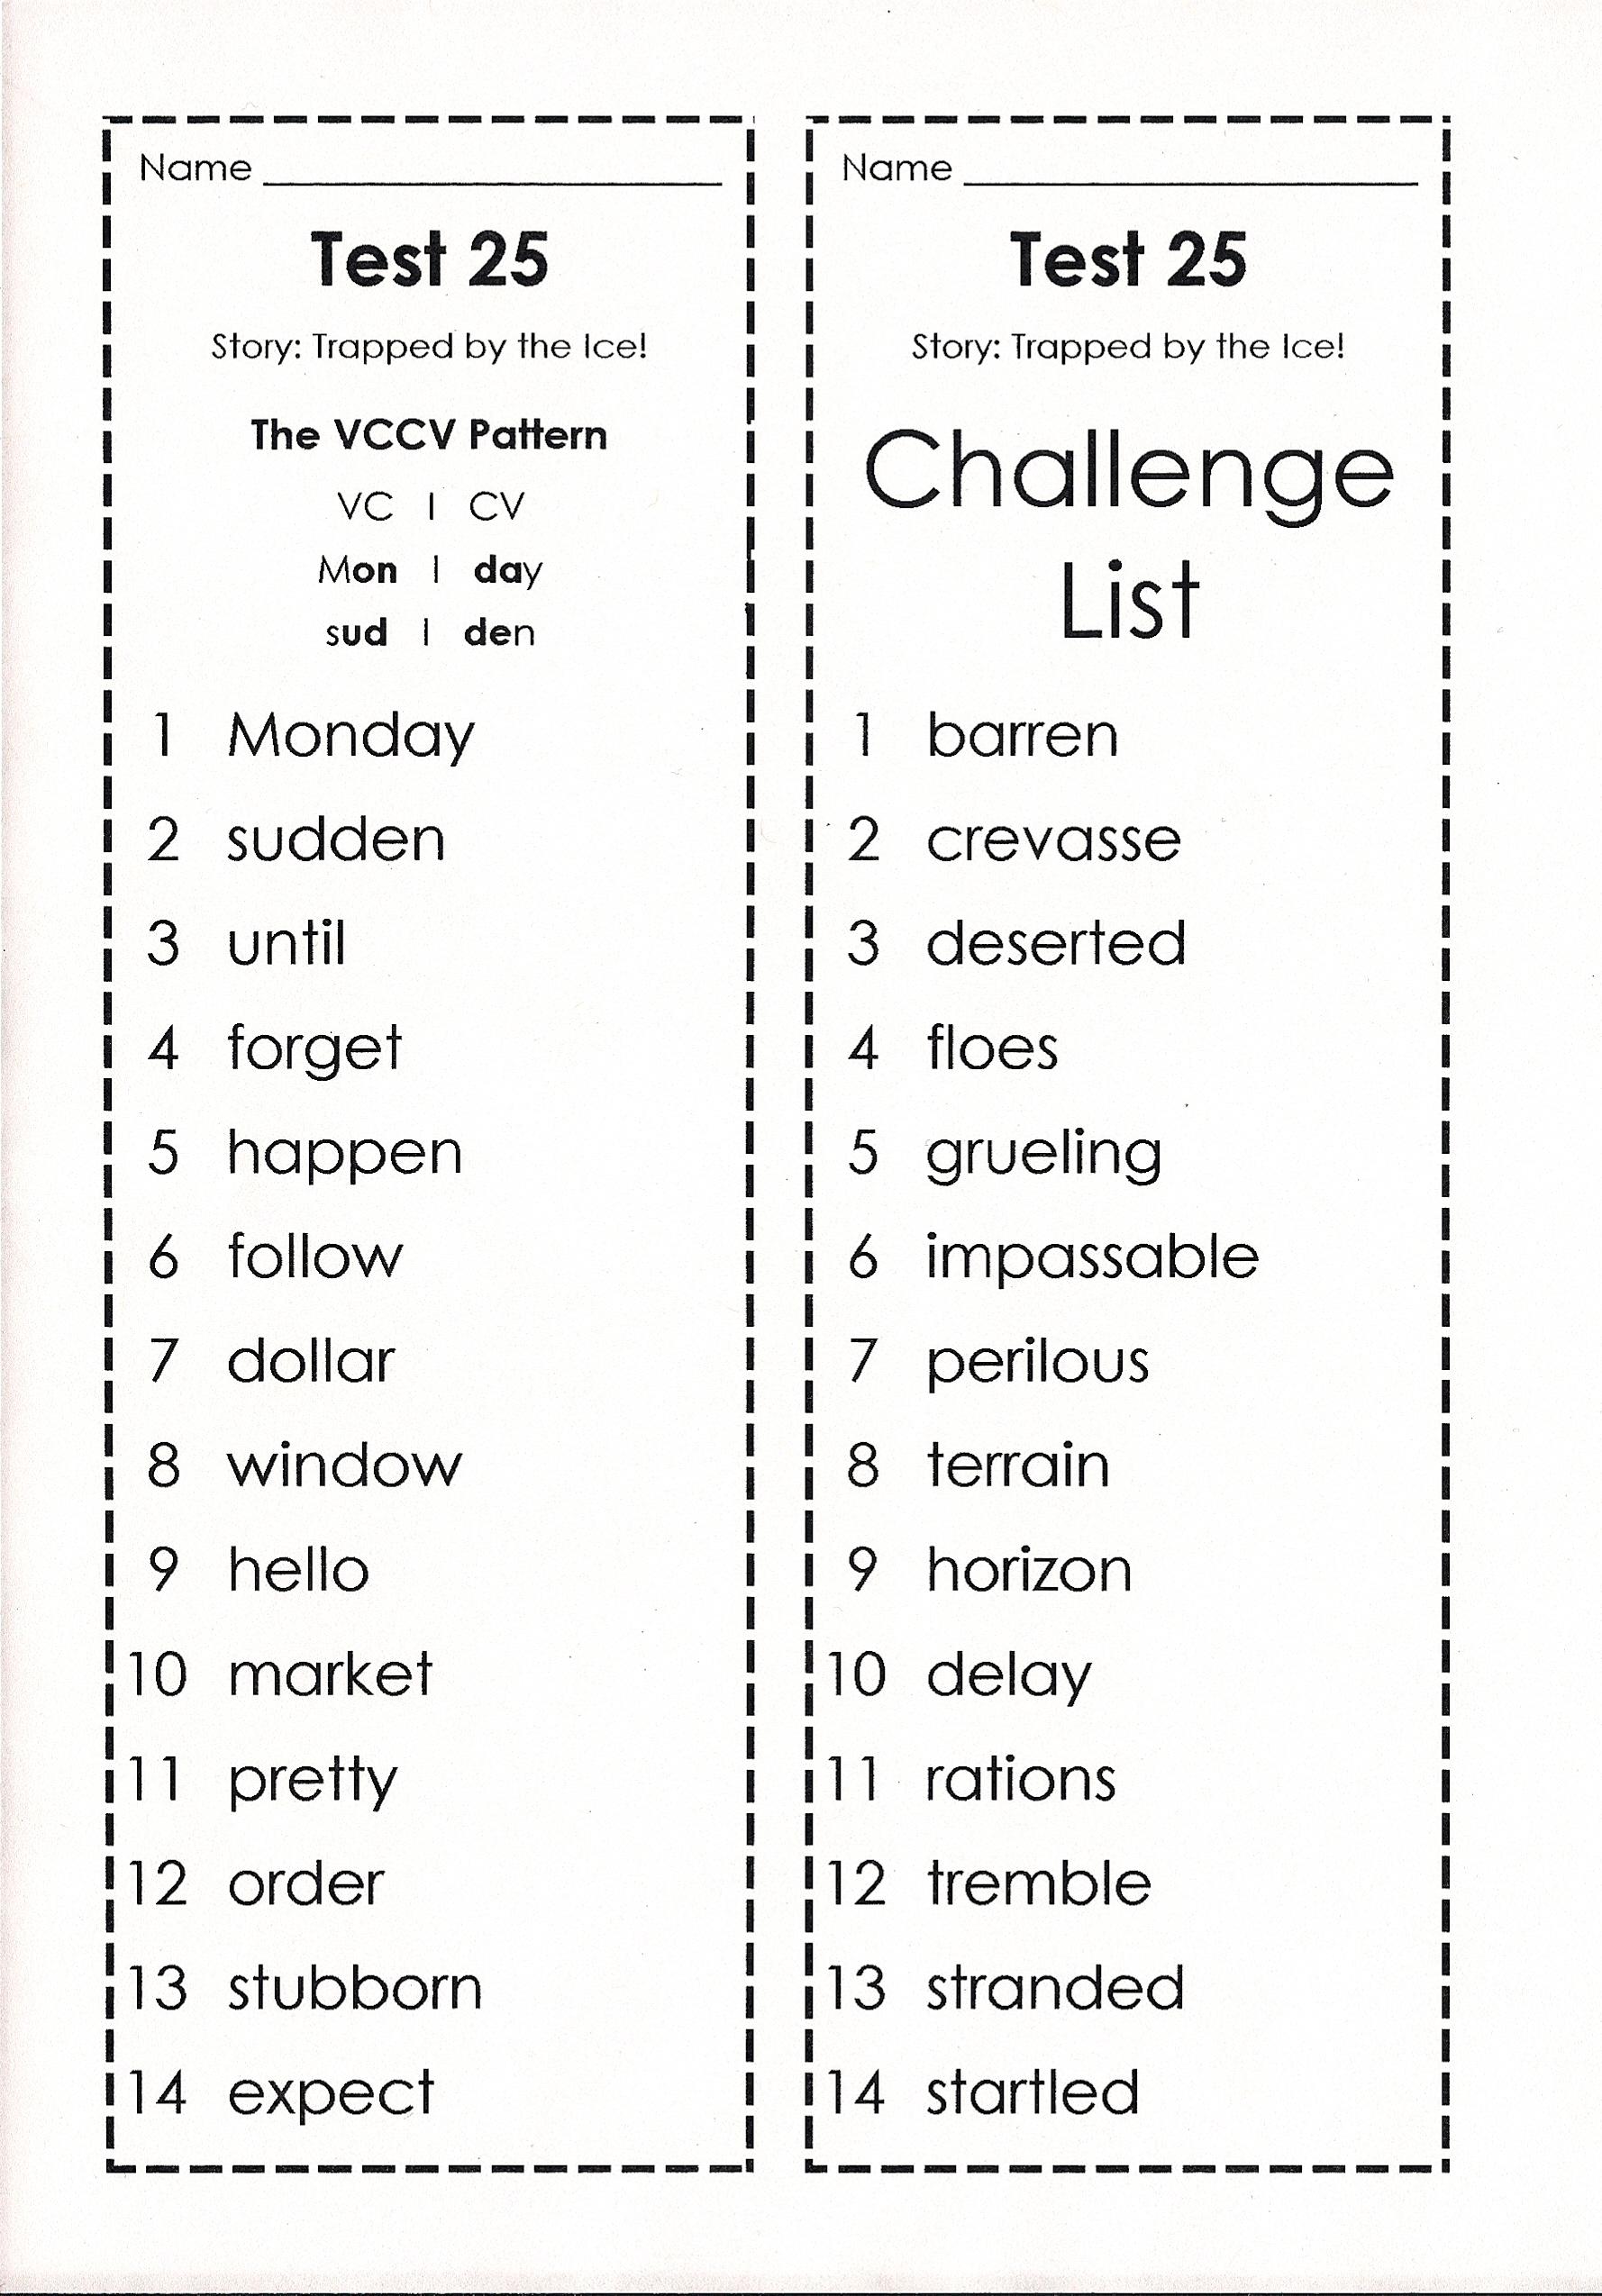 Worksheet Monly Misspelled Words